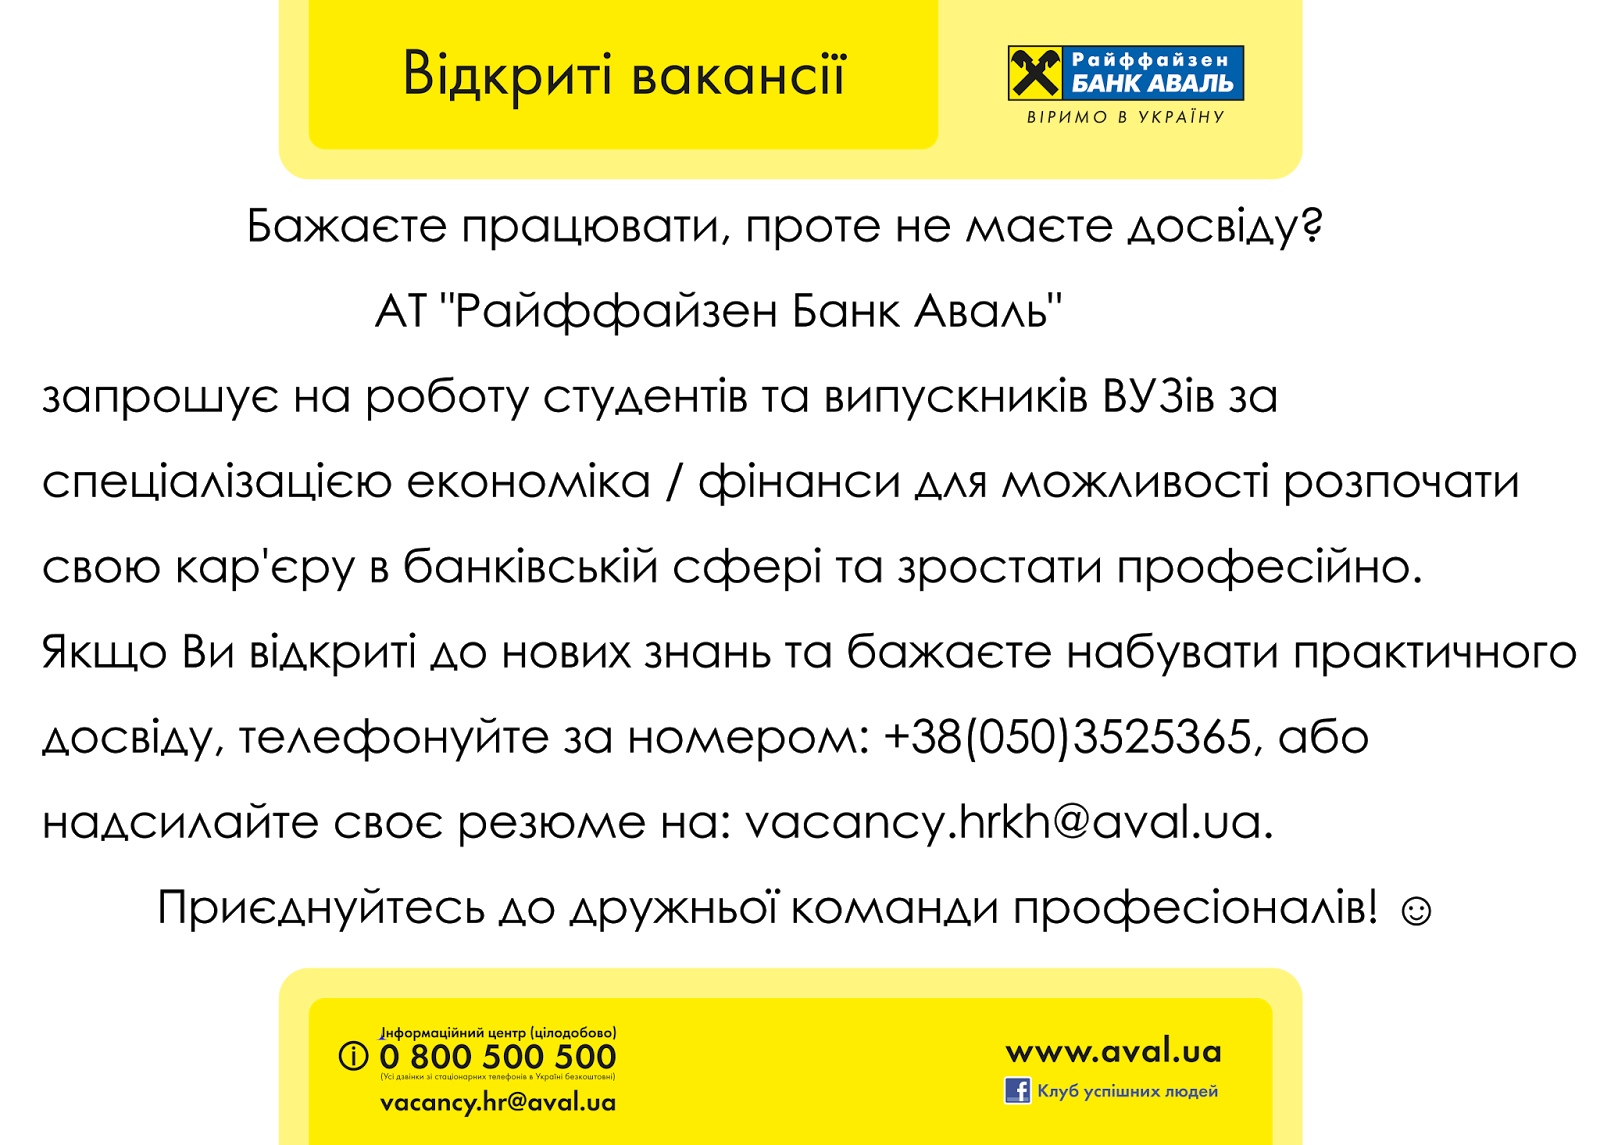 Робота у Райффайзен Банк Аваль